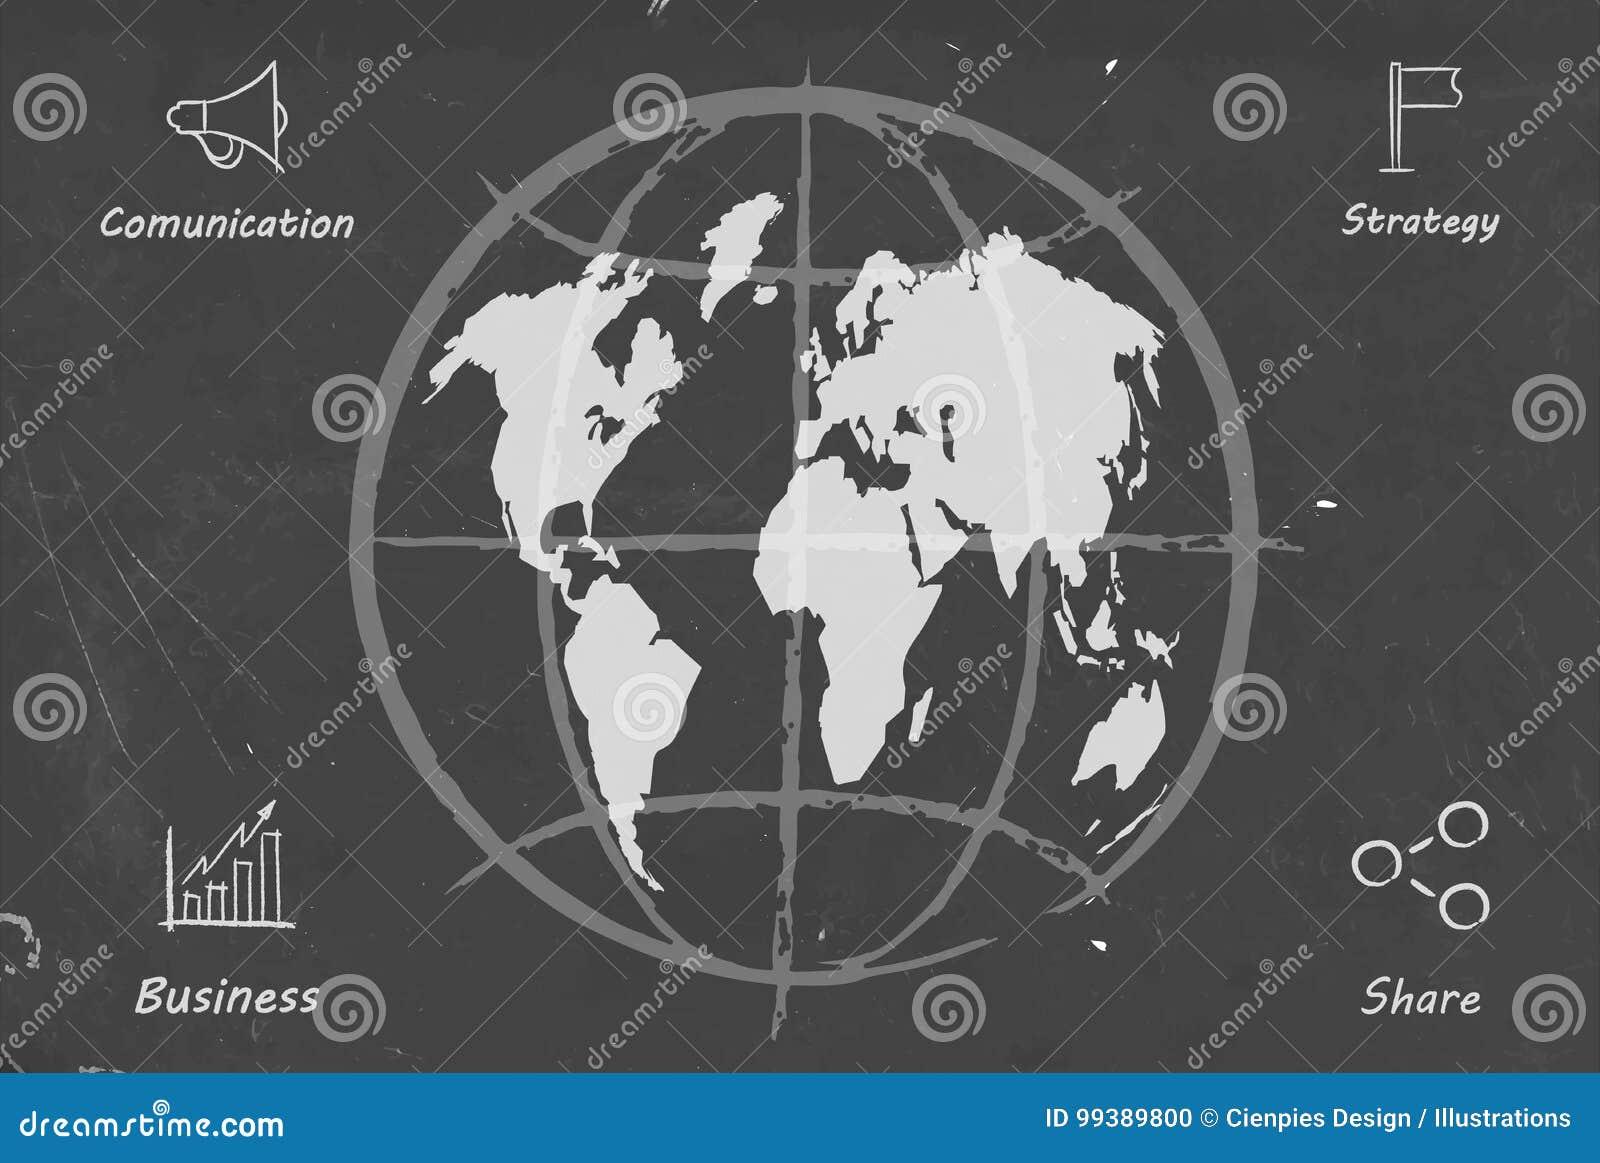 business world map blackboard sketch illustration stock vector